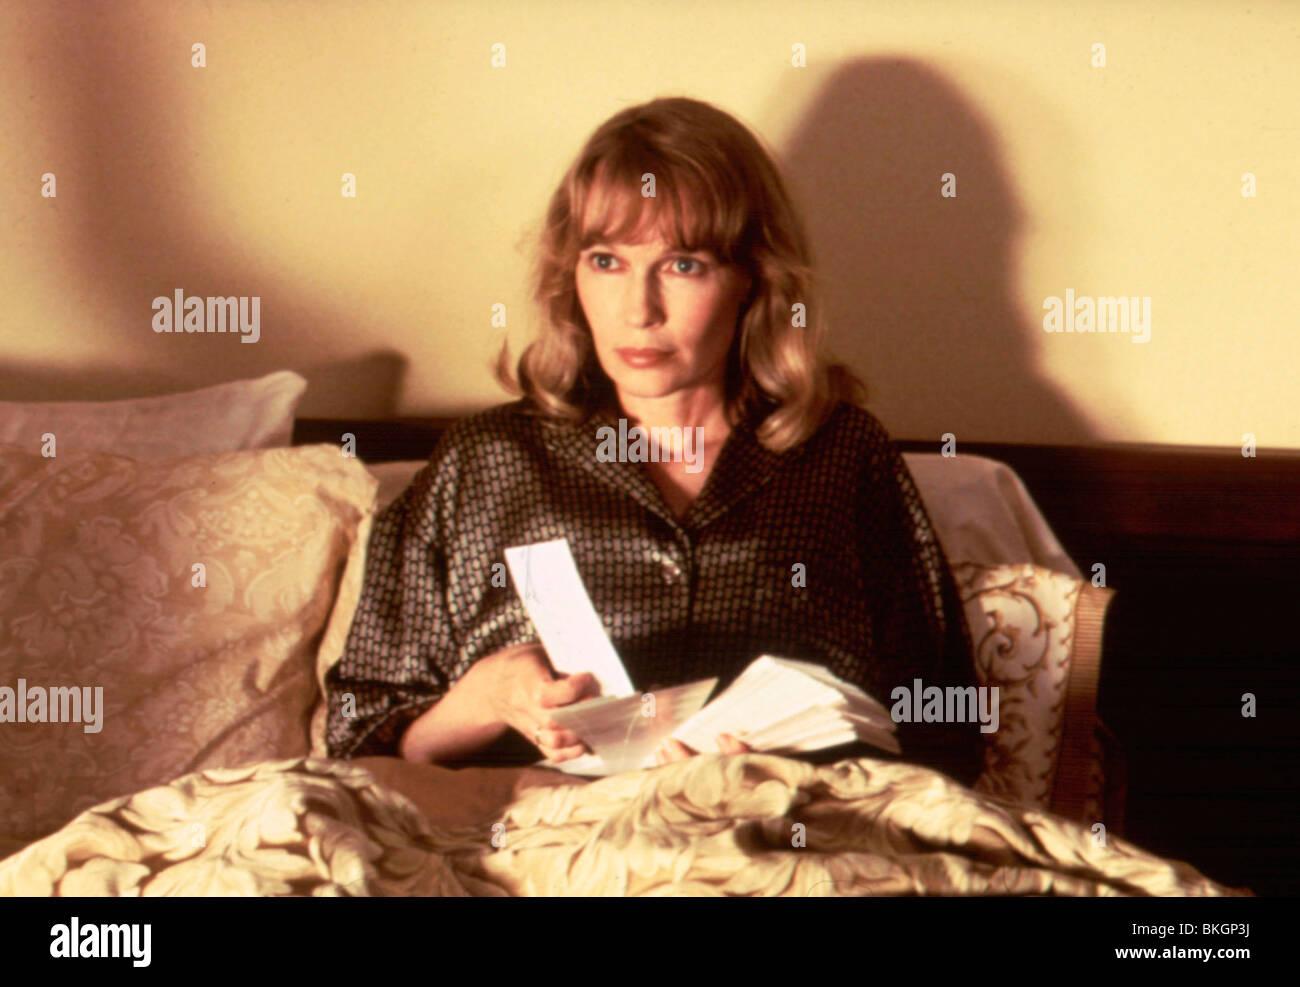 MIAMI RHAPSODY -1995 MIA FARROW - Stock Image